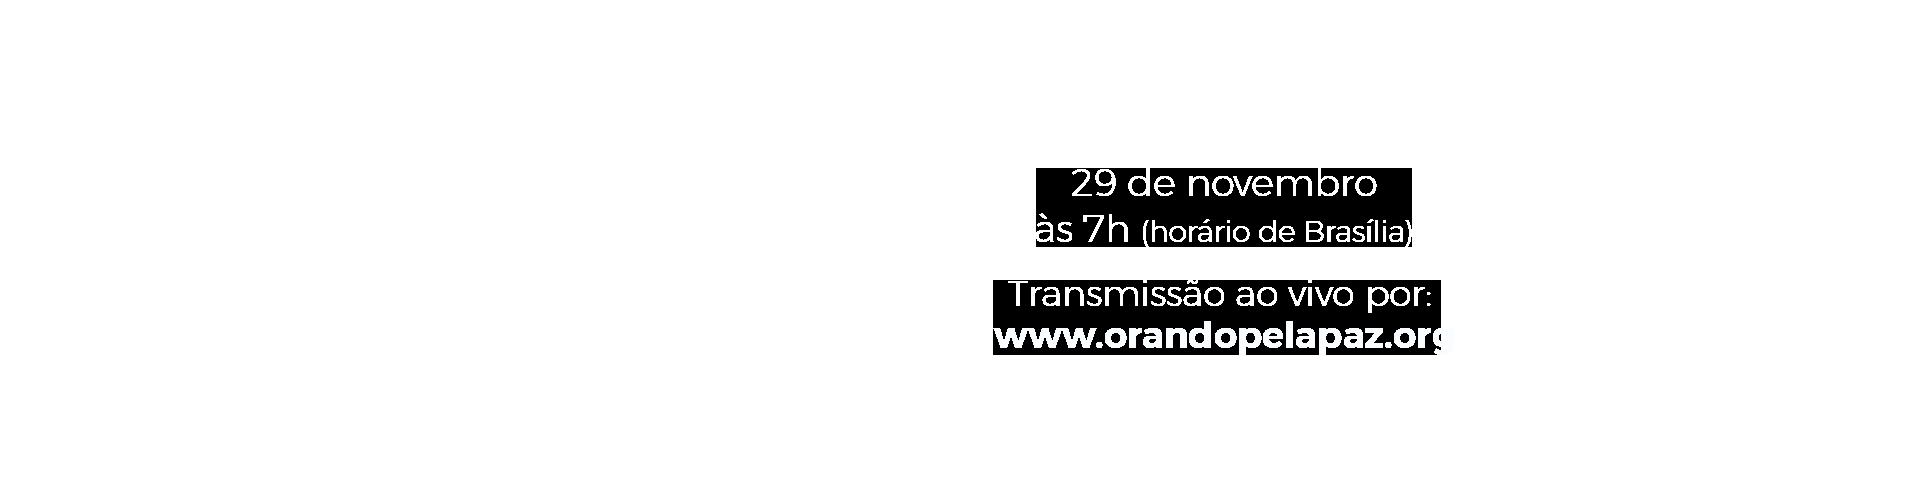 info-pt.png